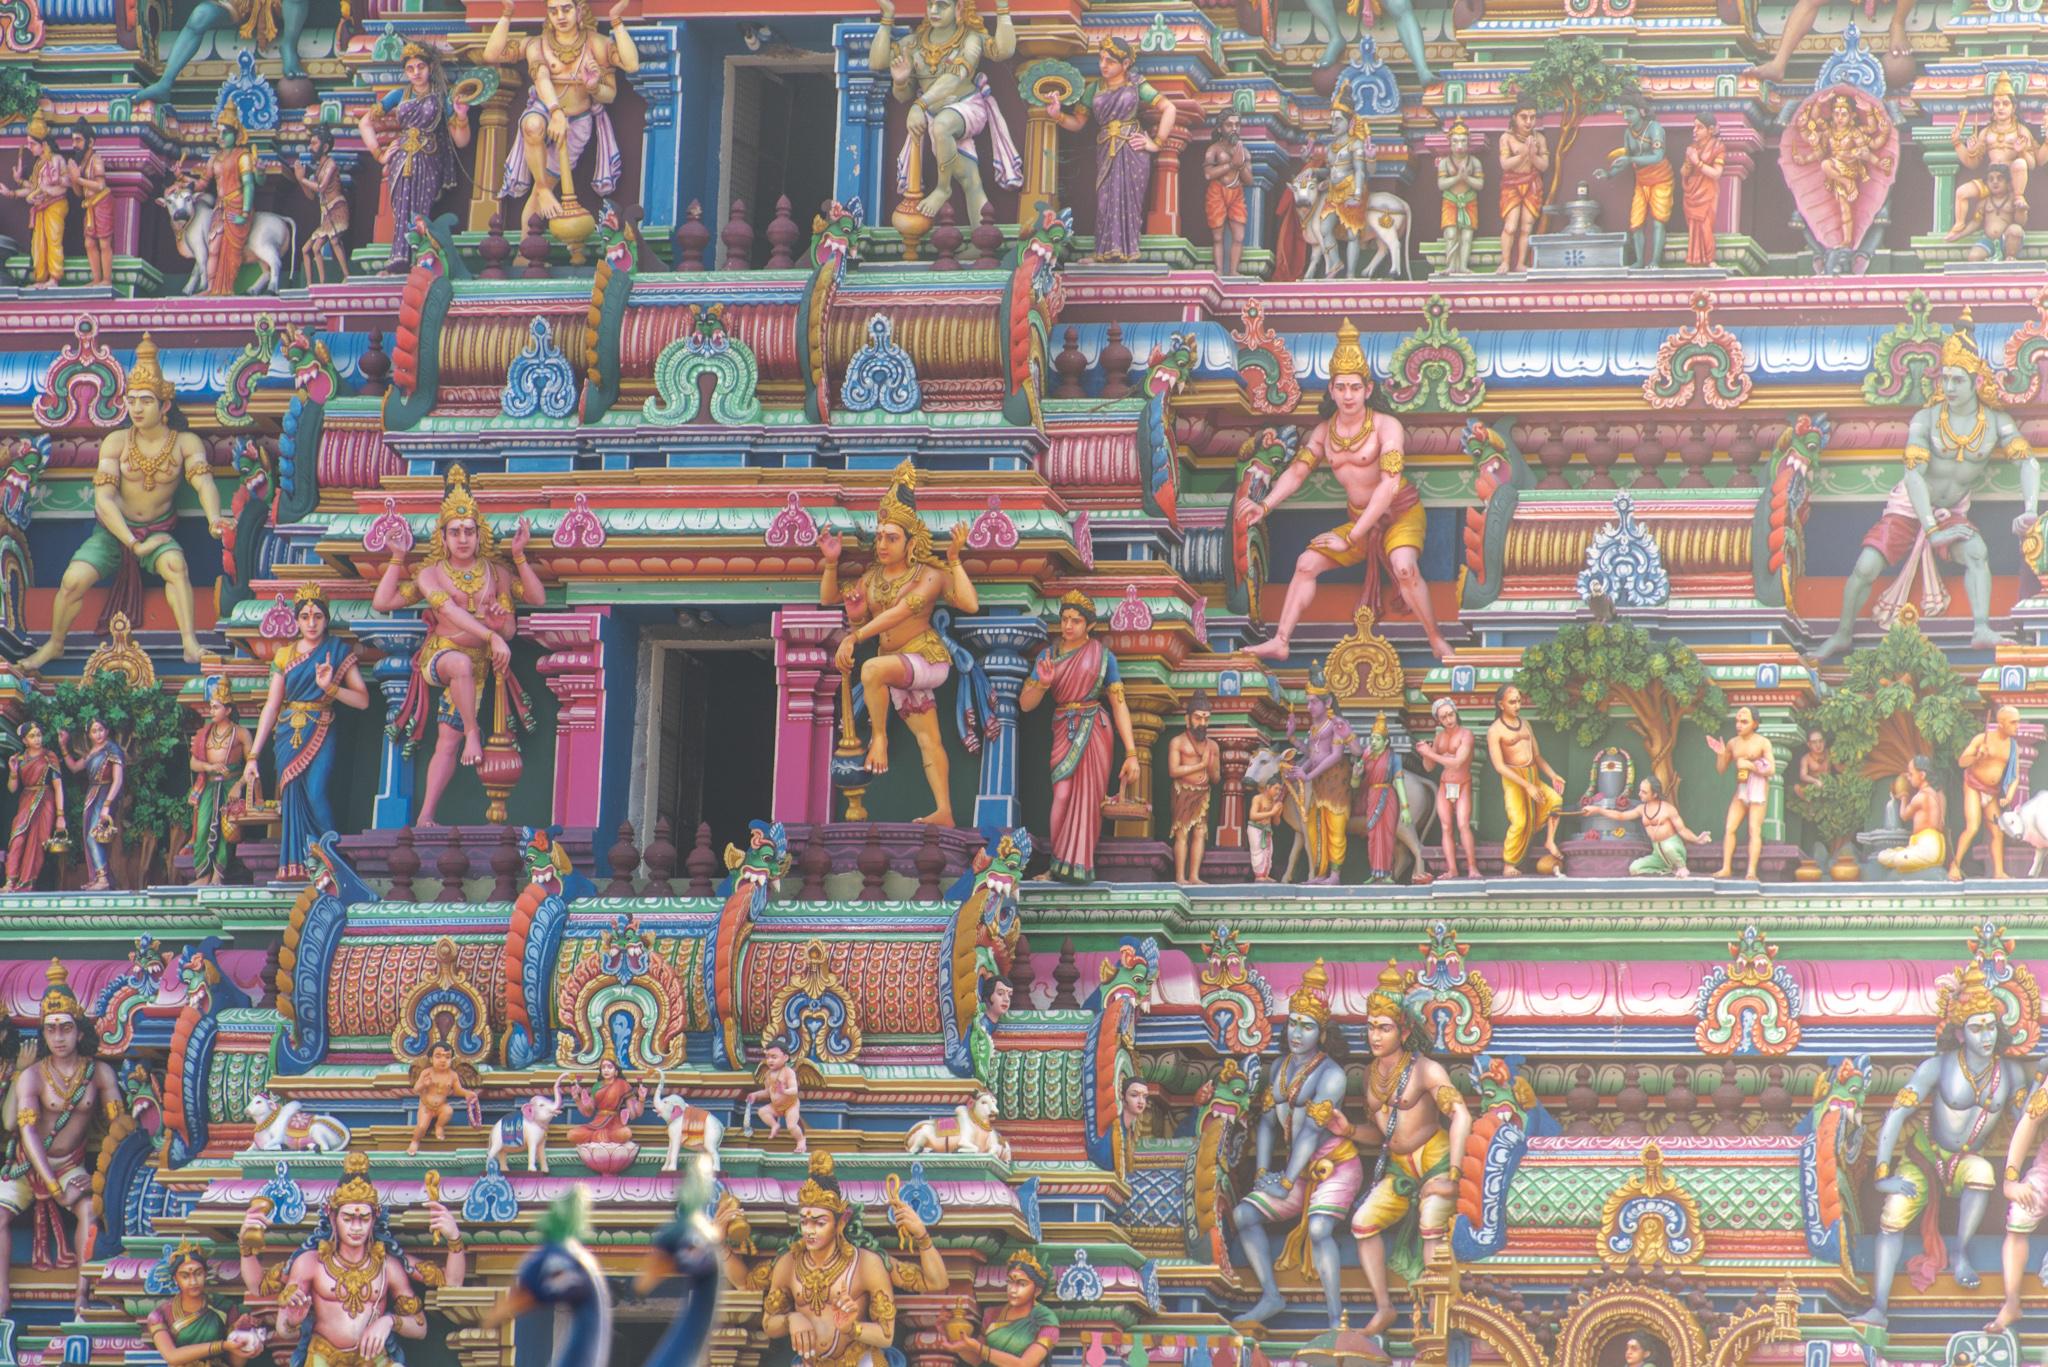 2016-12-20 - Kapaleeshwarar Temple - 036